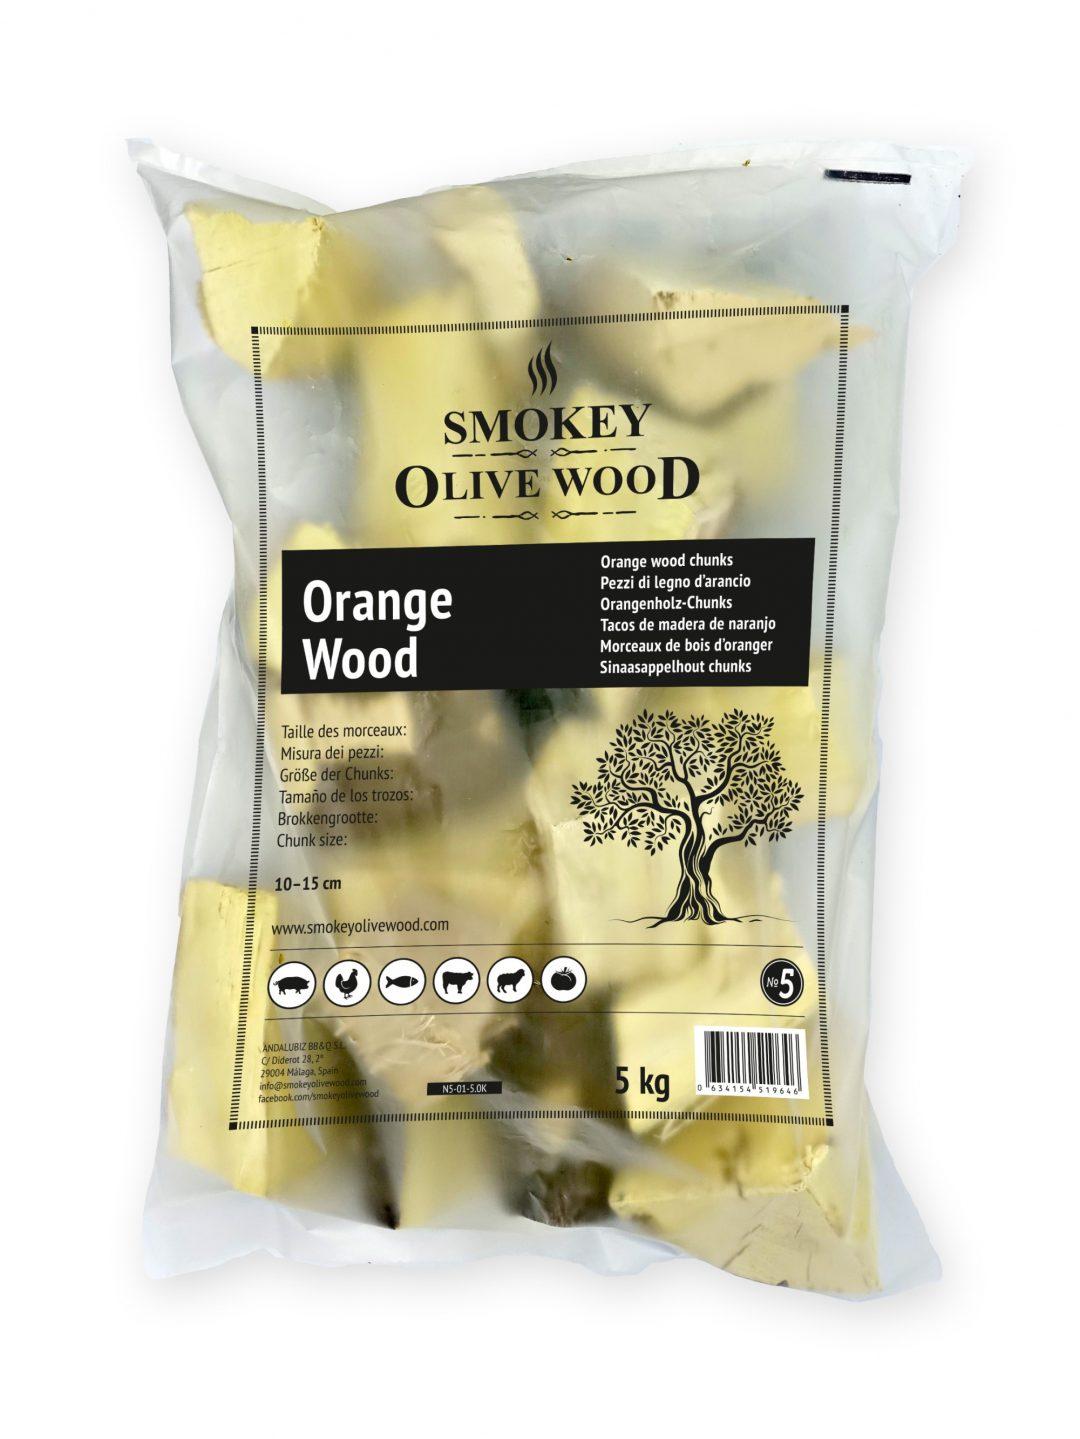 SOW orange wood chunks